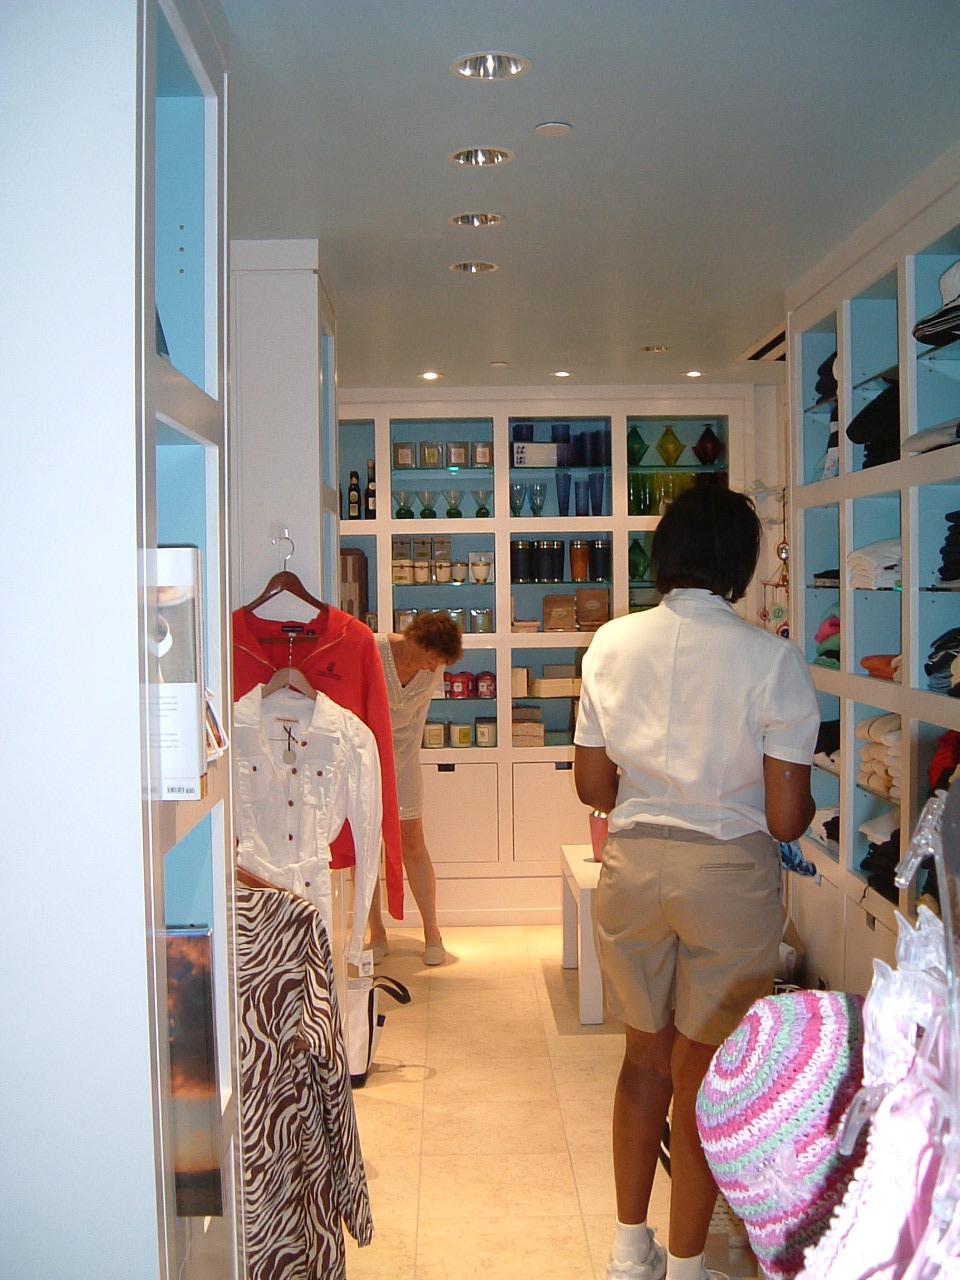 Cupboard Ice Cream Souvenir Shop